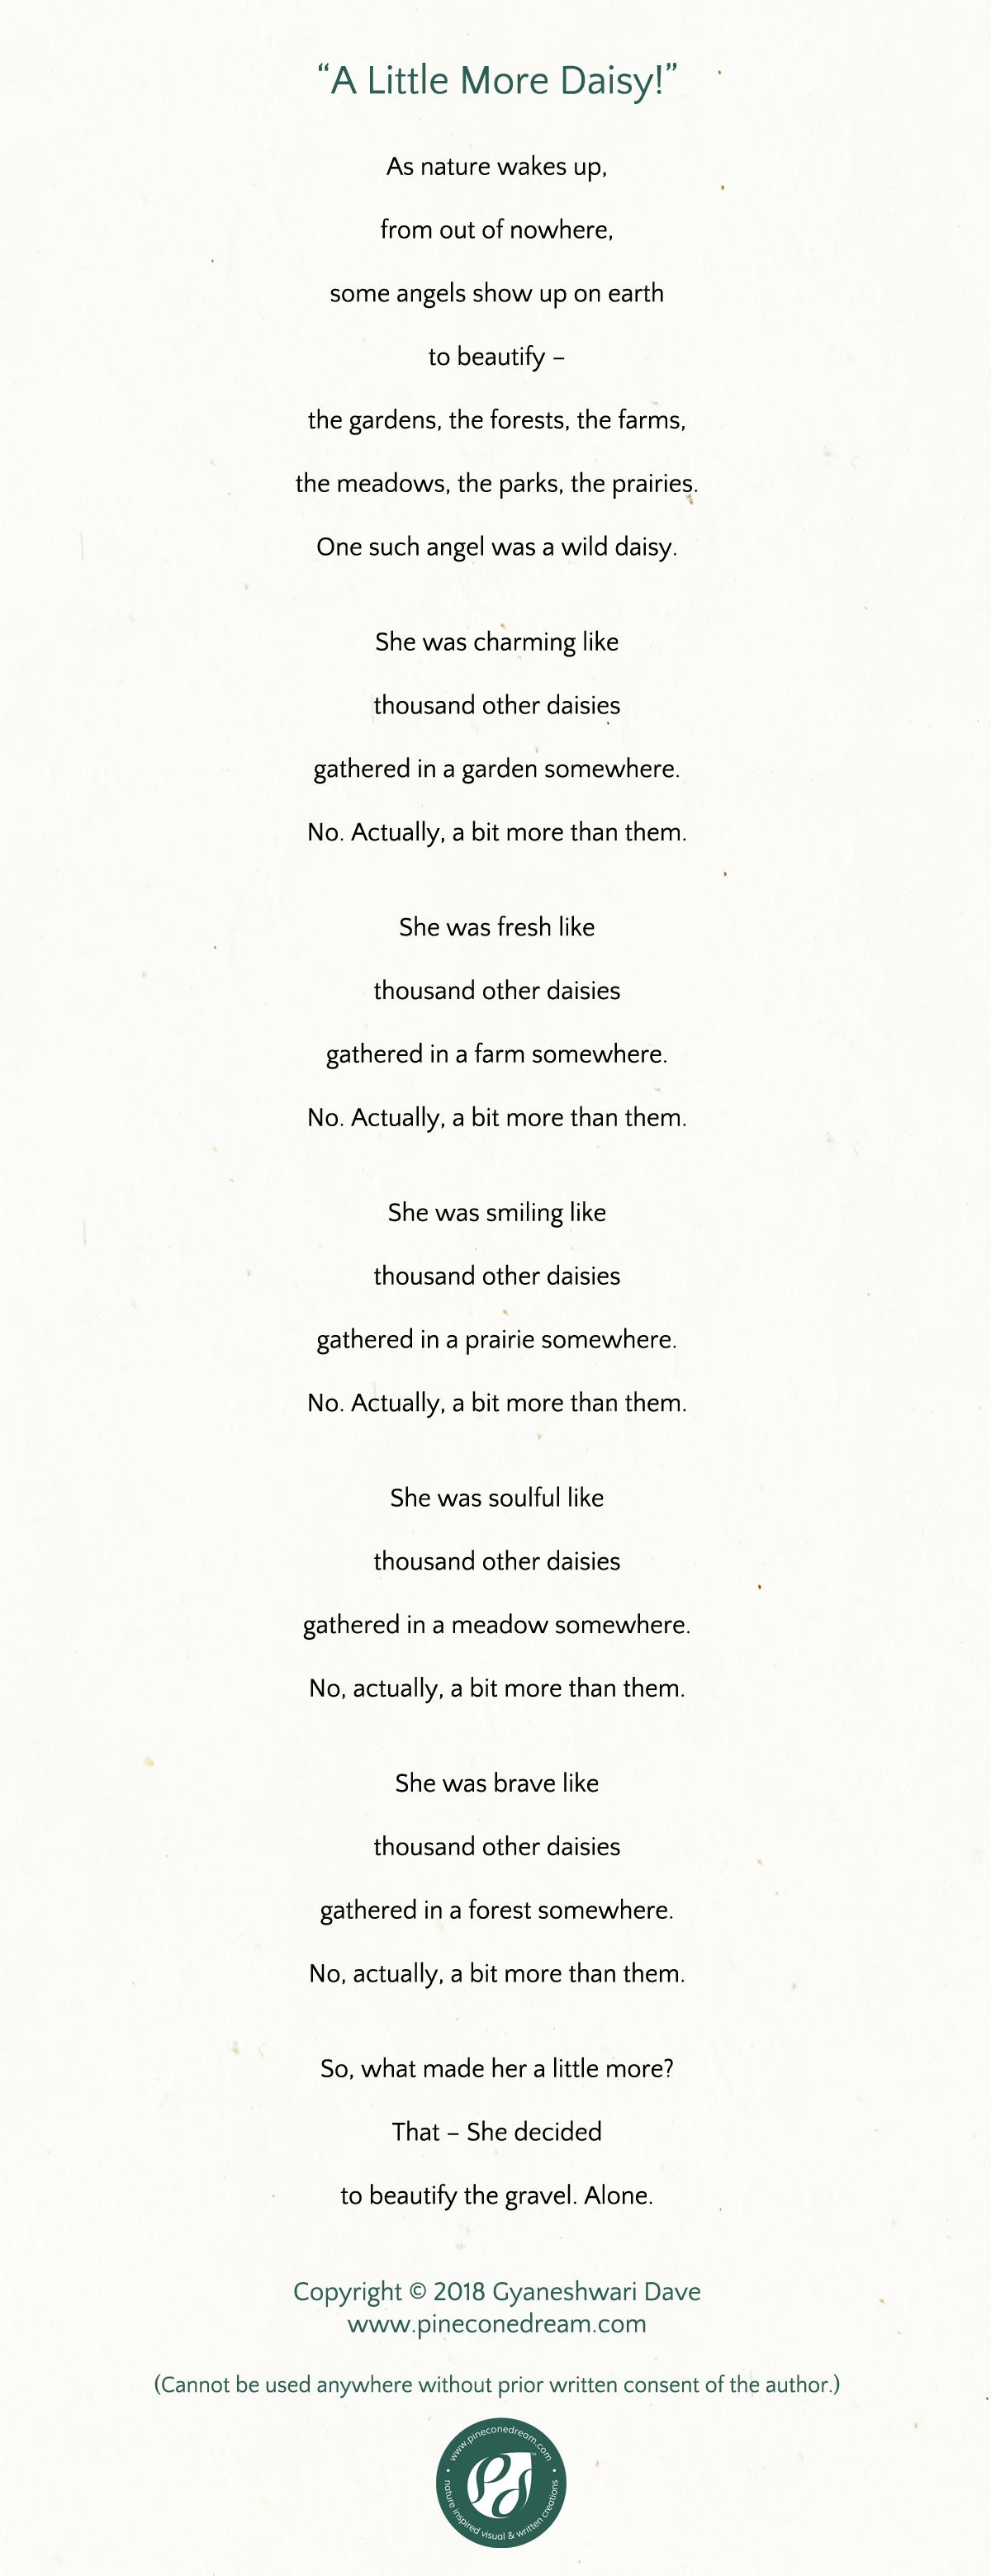 GyaneshwariDave_Poetry_ALittleMoreDaisy